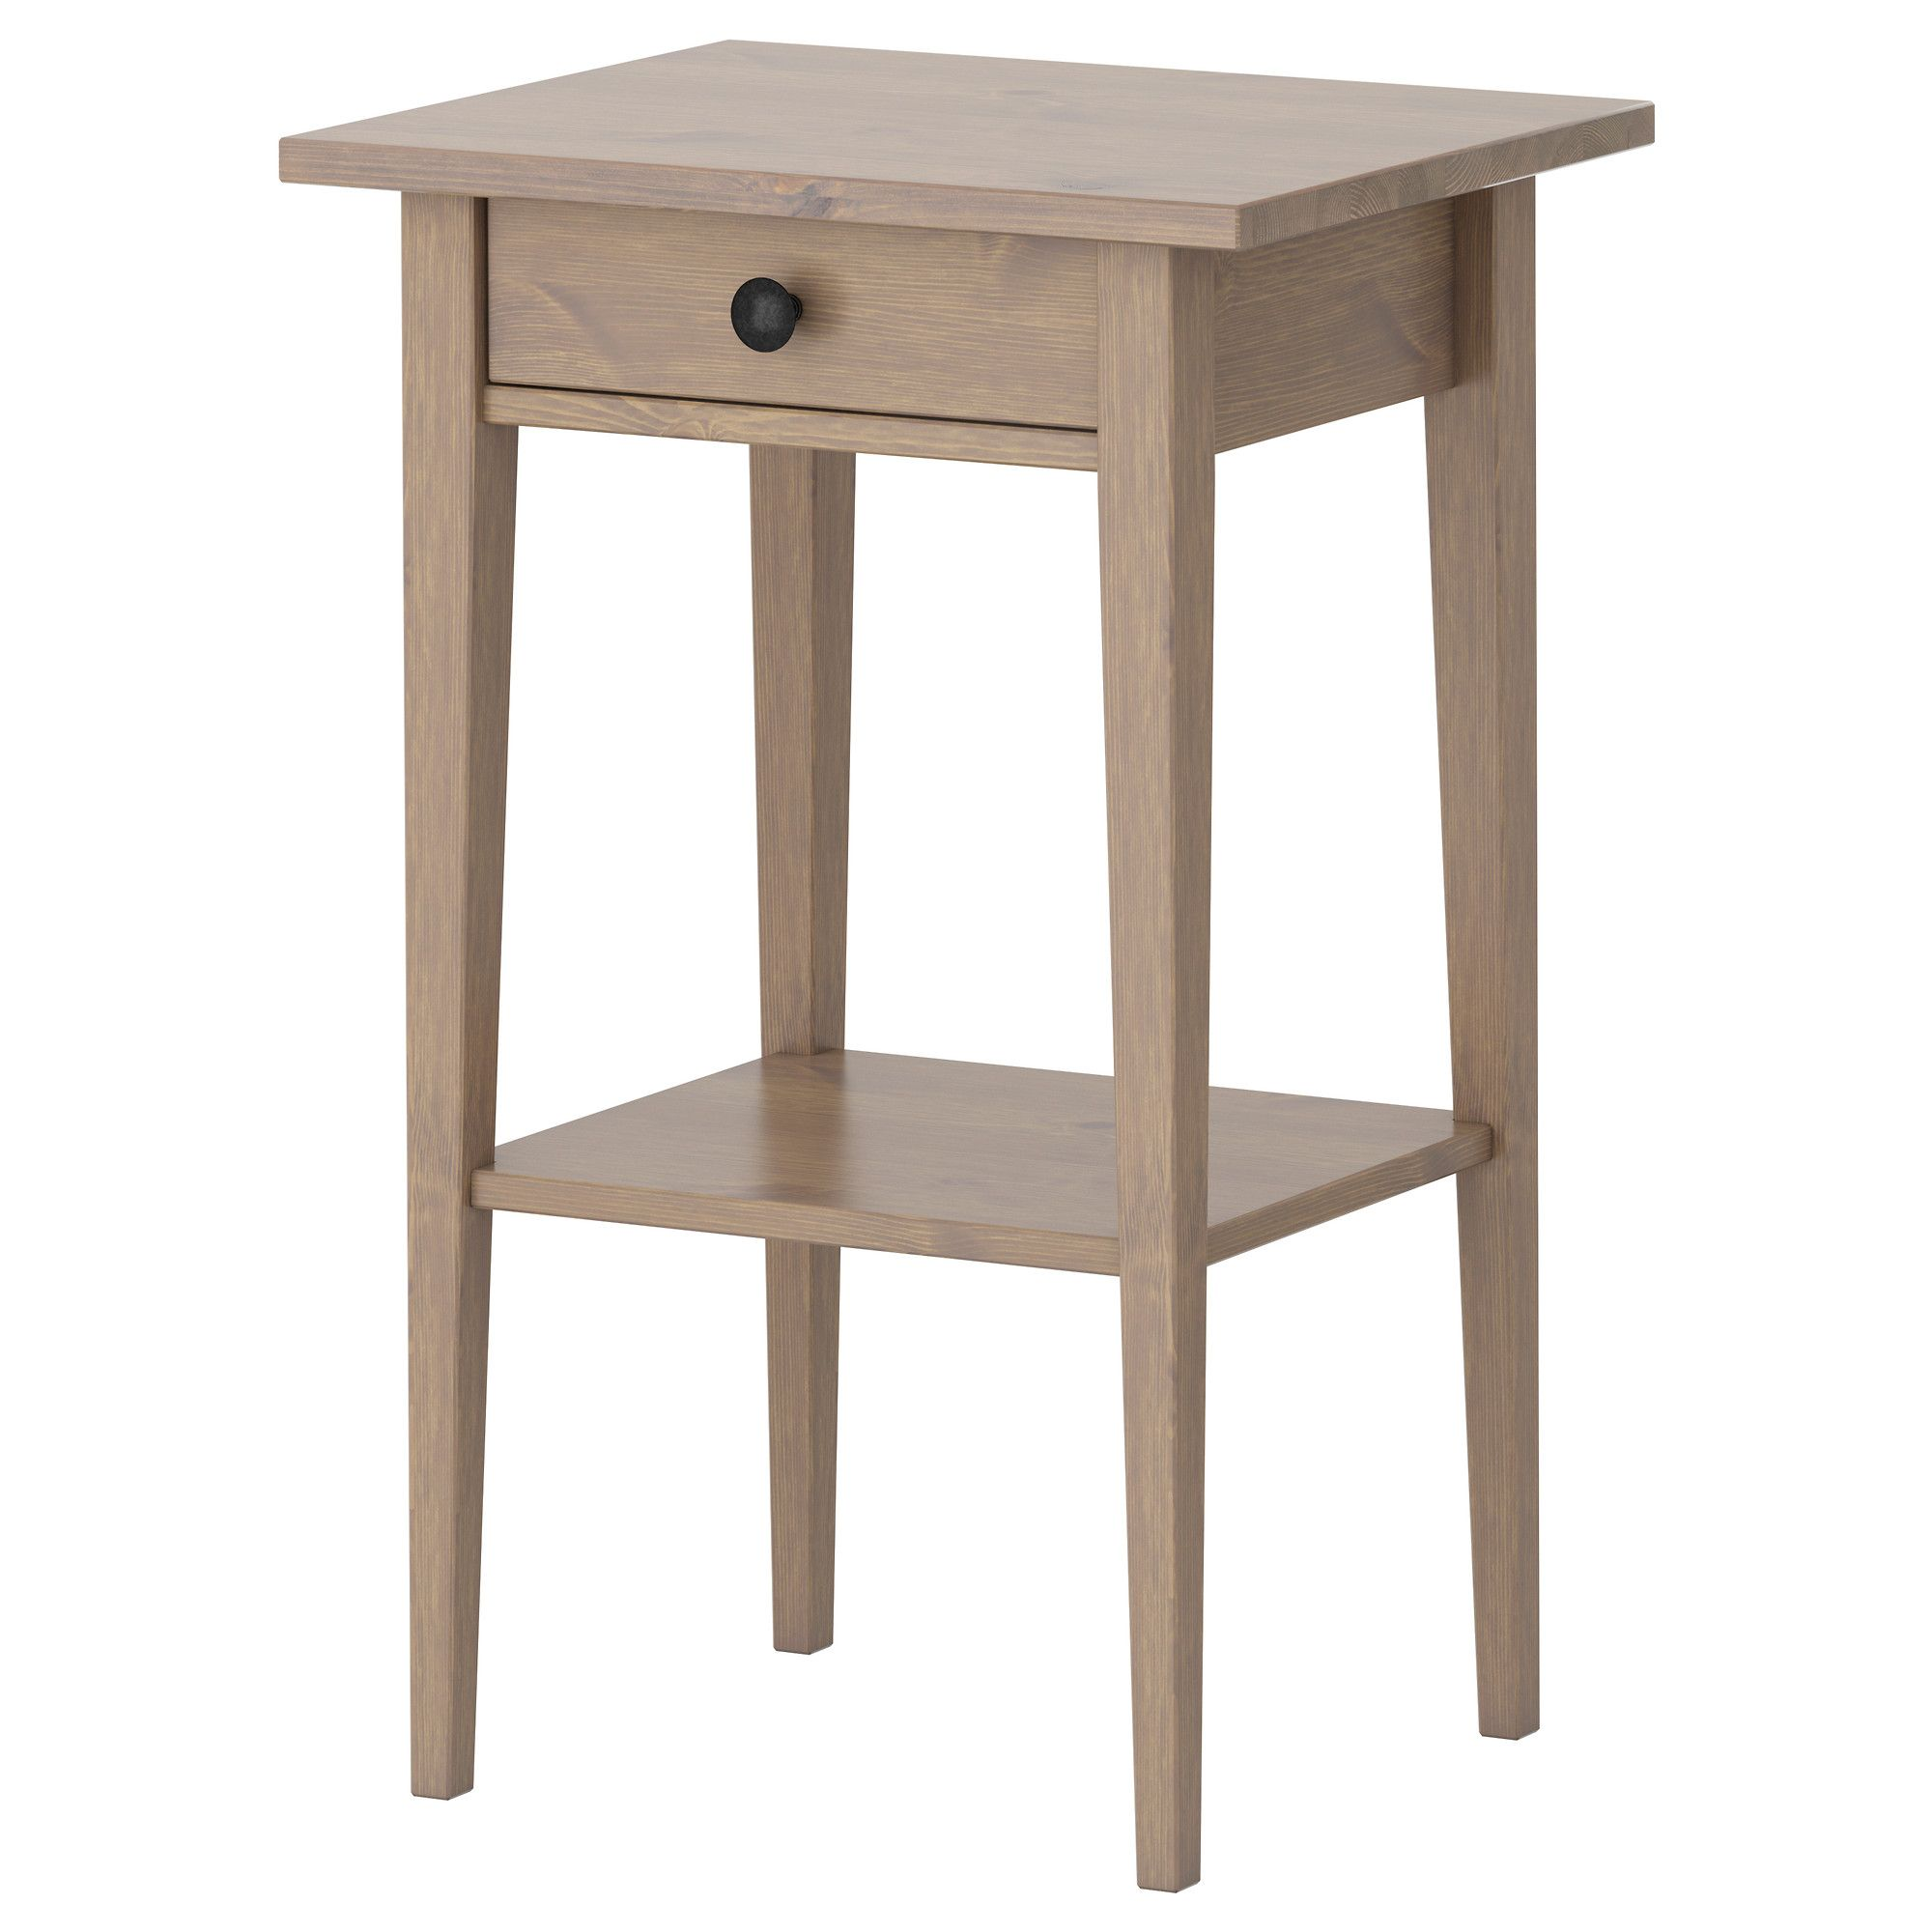 Folding table and chair set ikea ikea hemnes hemnes daybeds ideas - Hemnes Nightstand Gray Brown Ikea Master Bedroom